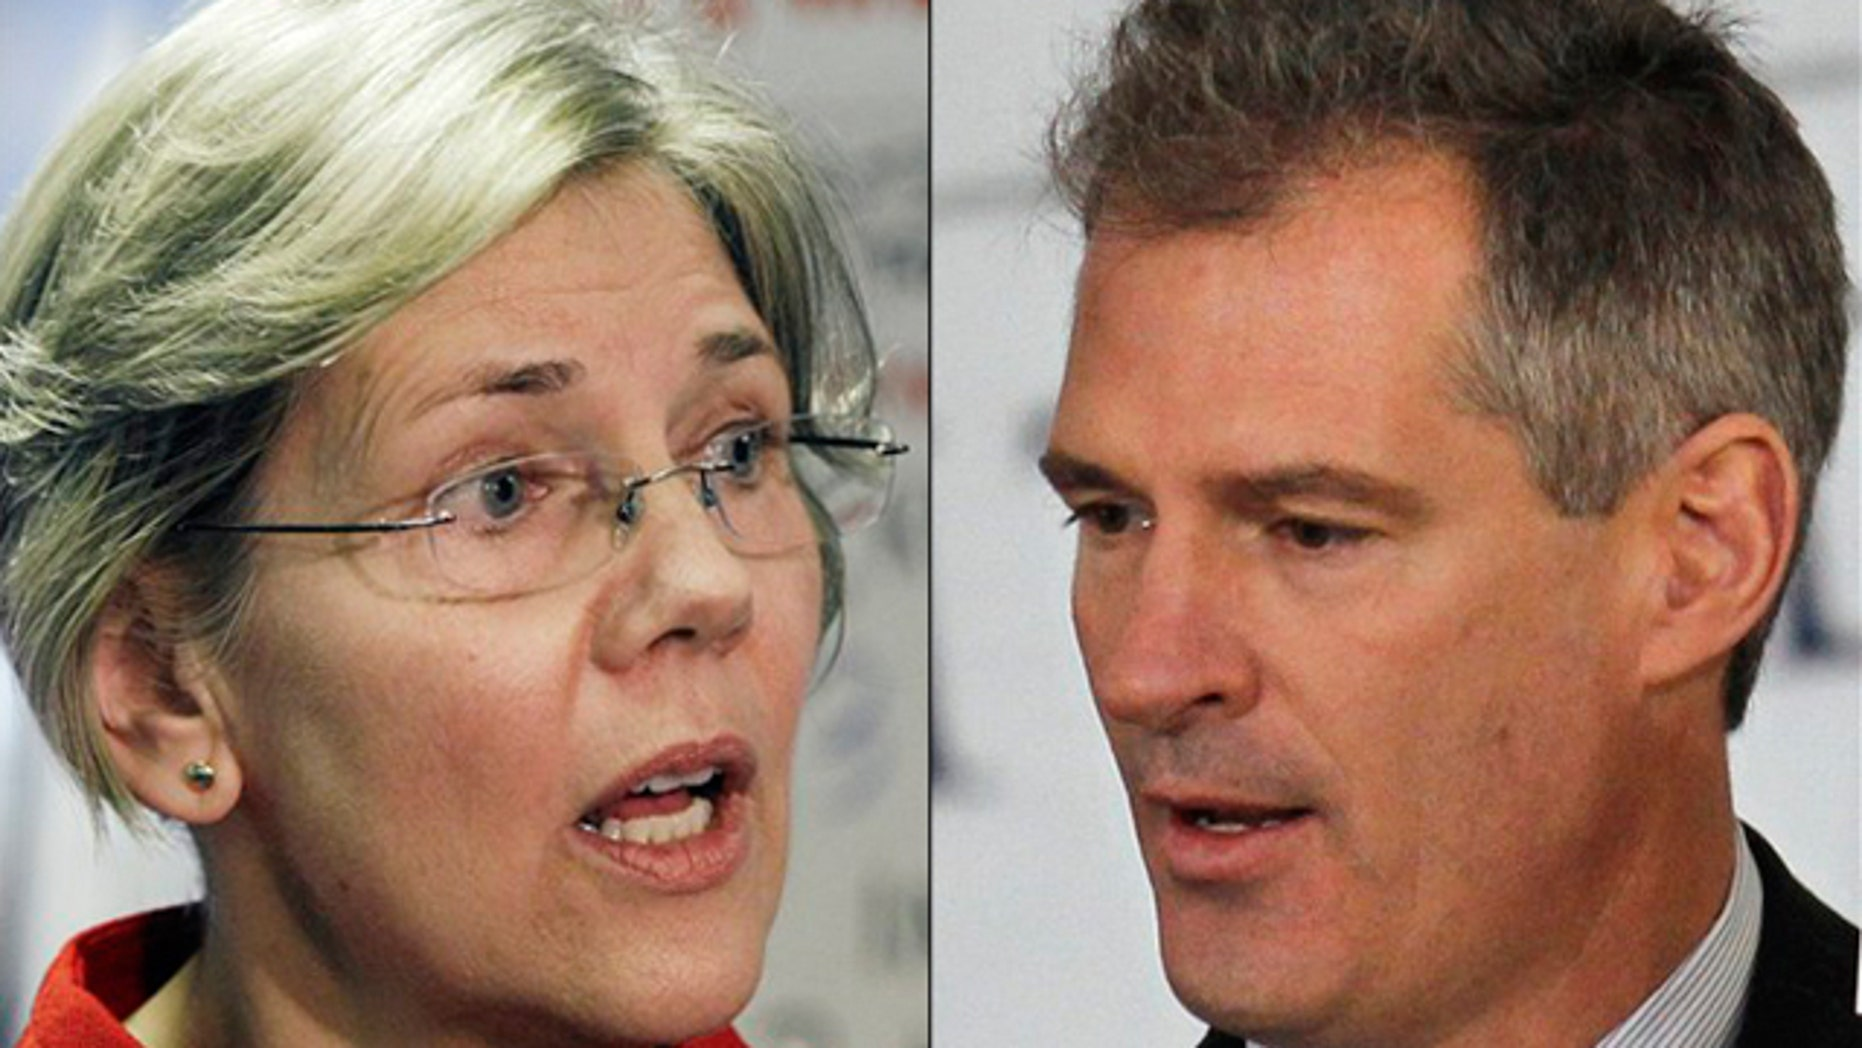 Shown here are Massachusetts Democratic Senate candidates Elizabeth Warren, left, and Scott Brown.